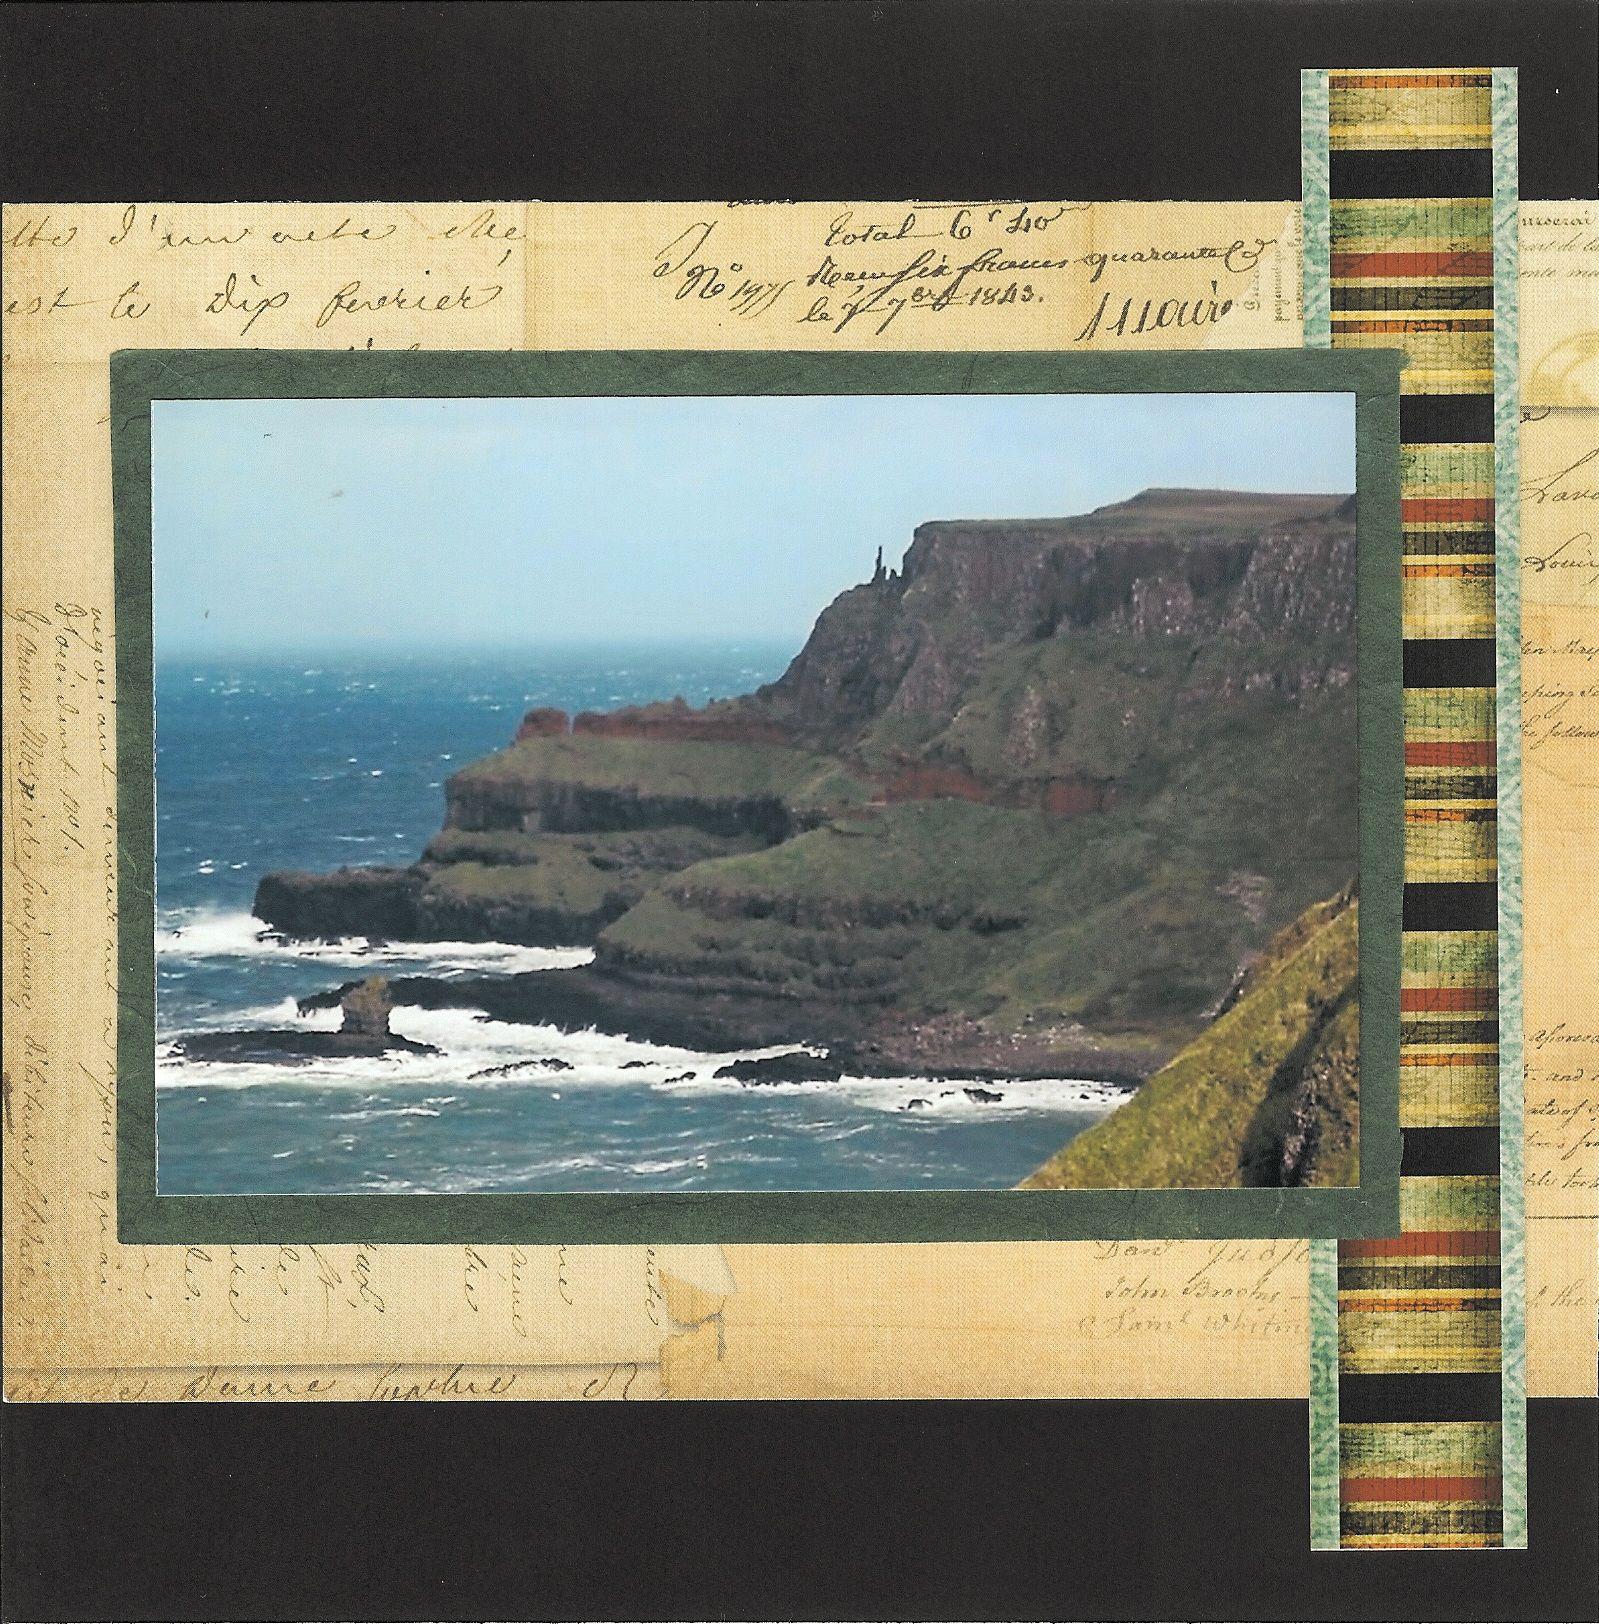 How to scrapbook 8x8 layouts - 8x8 Scrapbook Layout Ireland Album Page 8